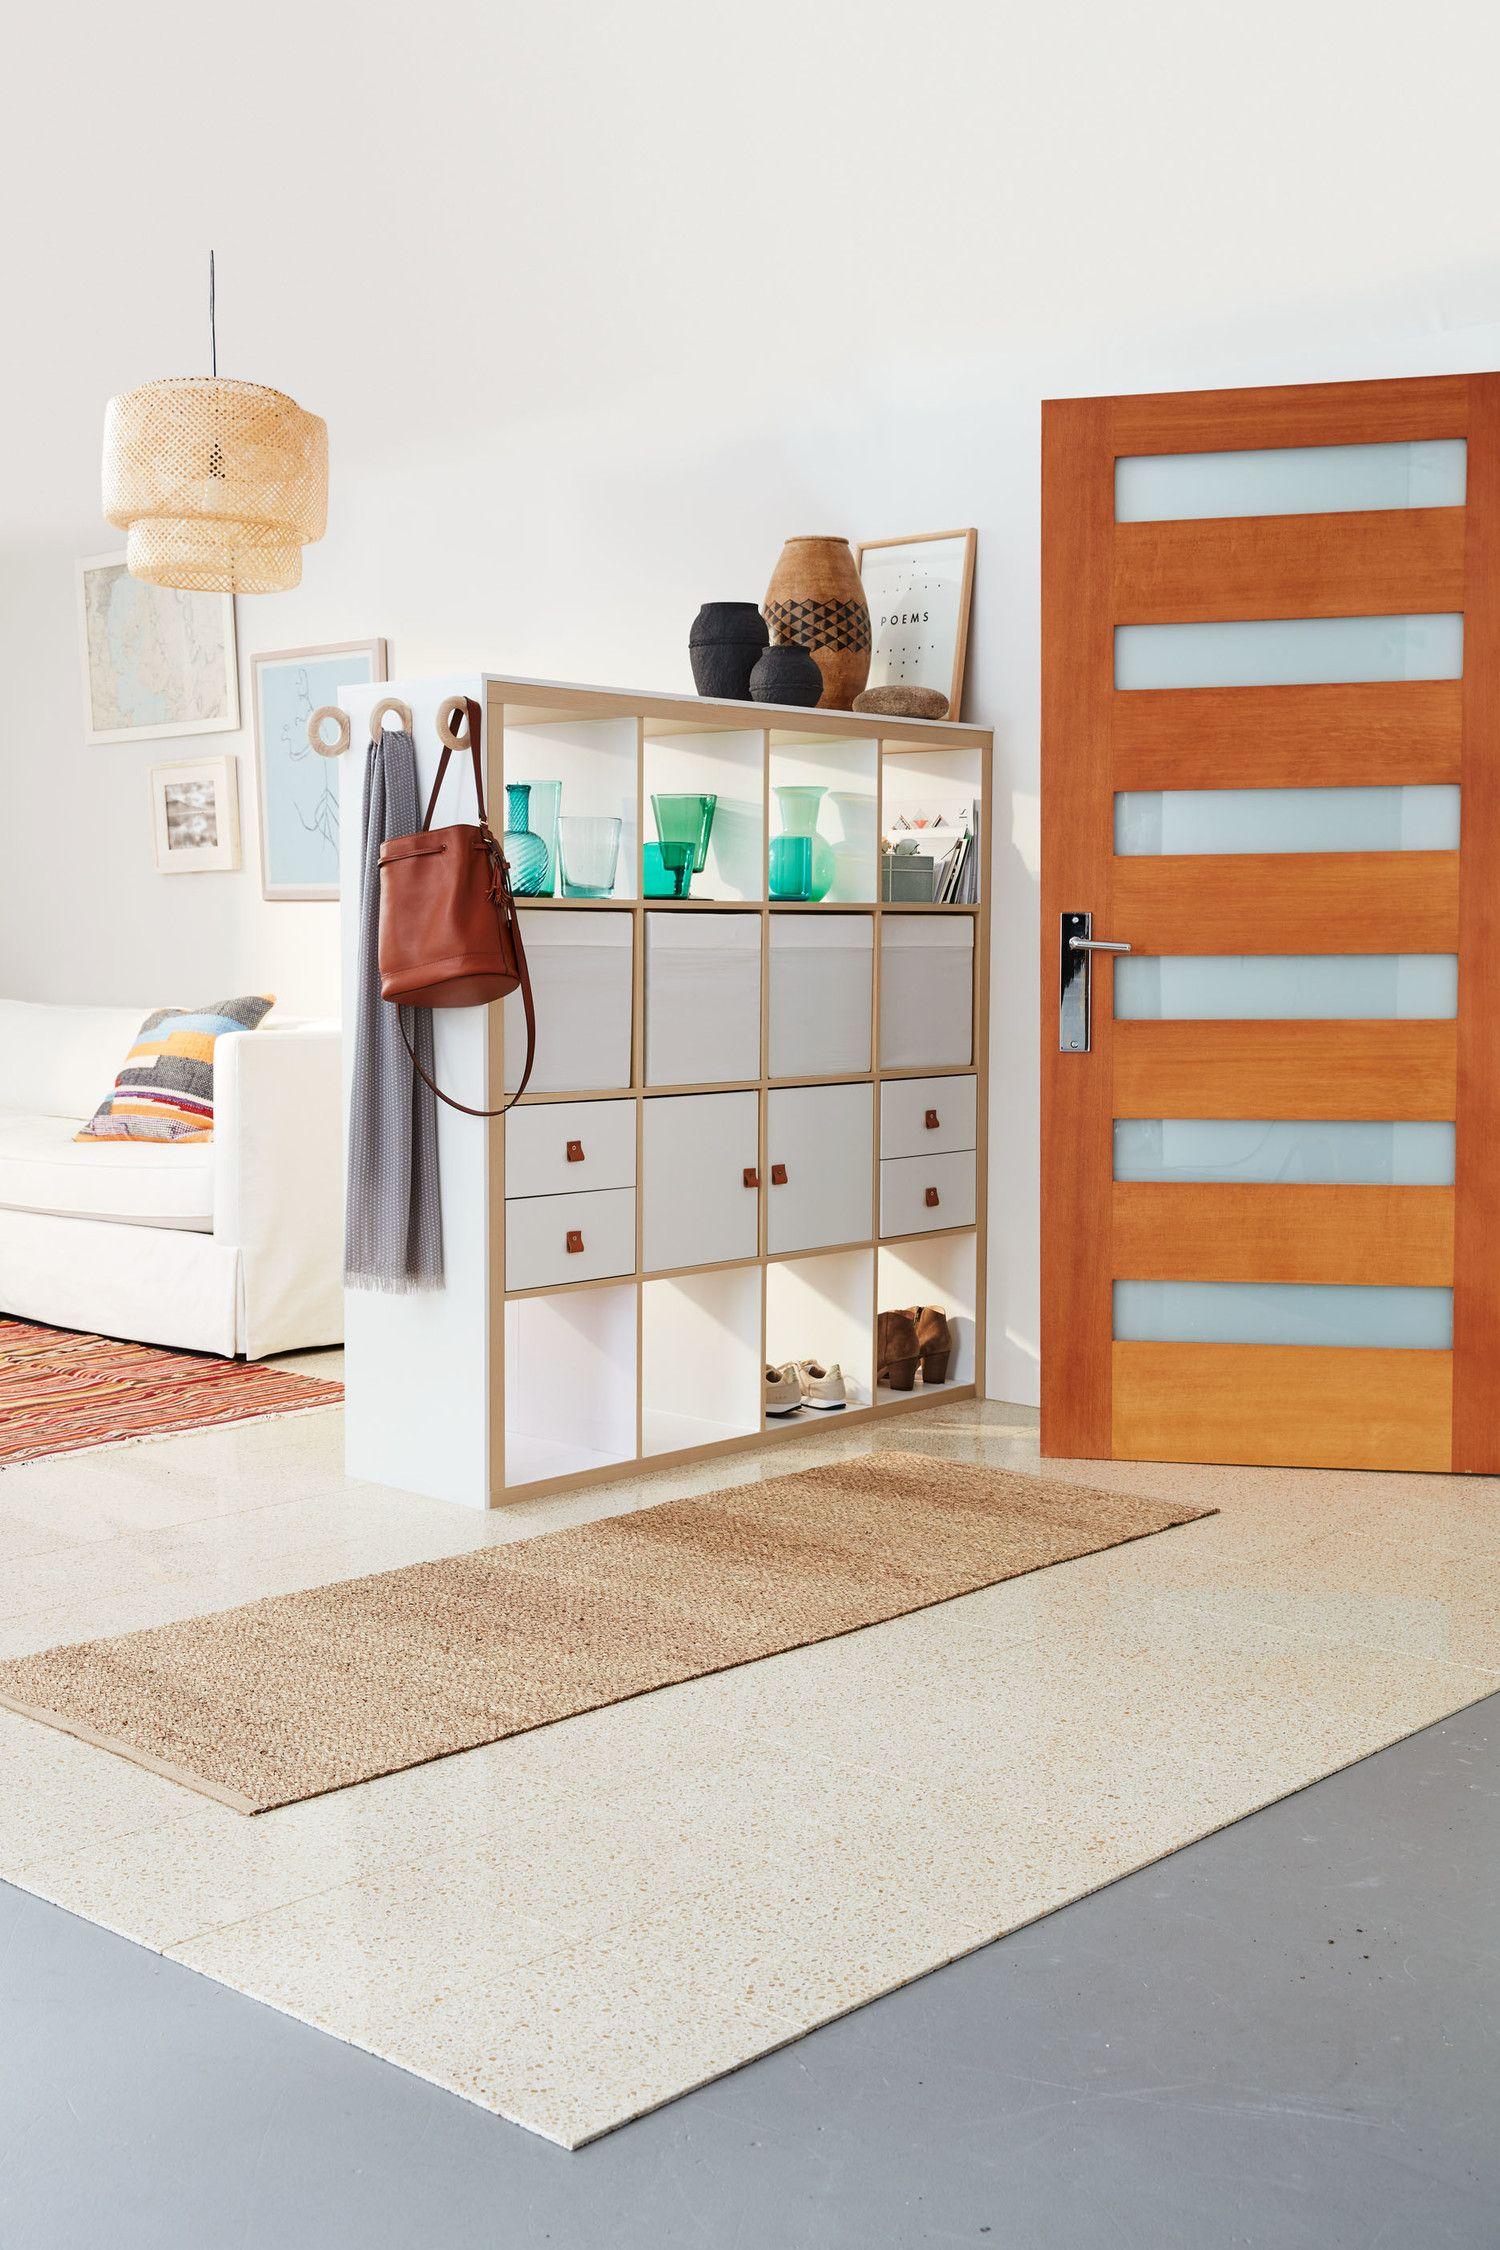 Rooms for Improvement 11 Simply Genius DIY